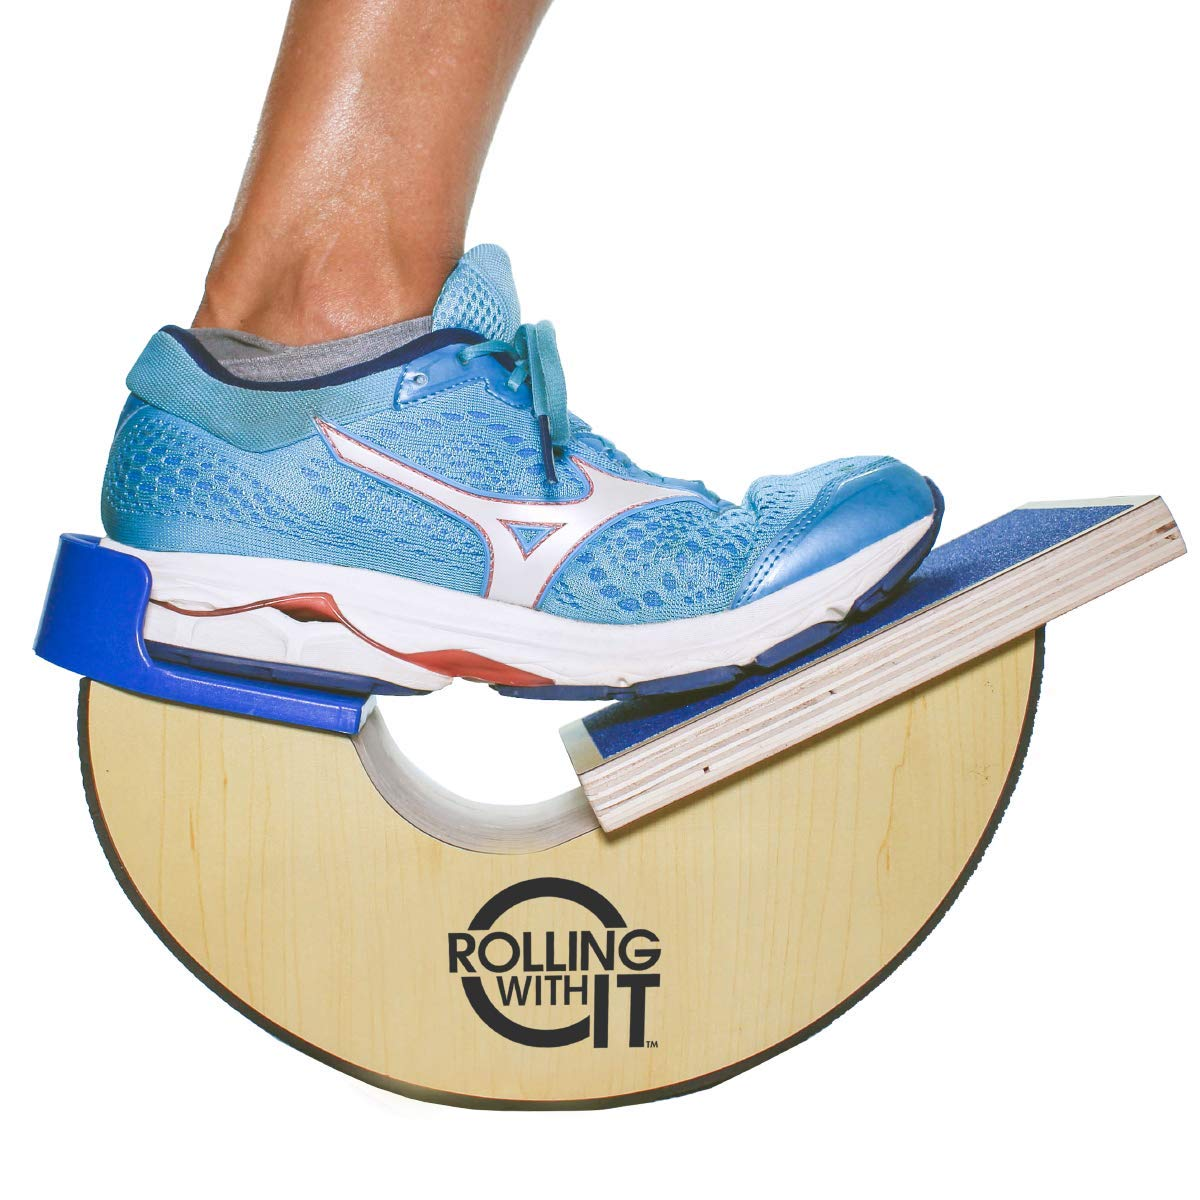 Foot rocker stretcher foot rocker stretcher calf ankle stretch board